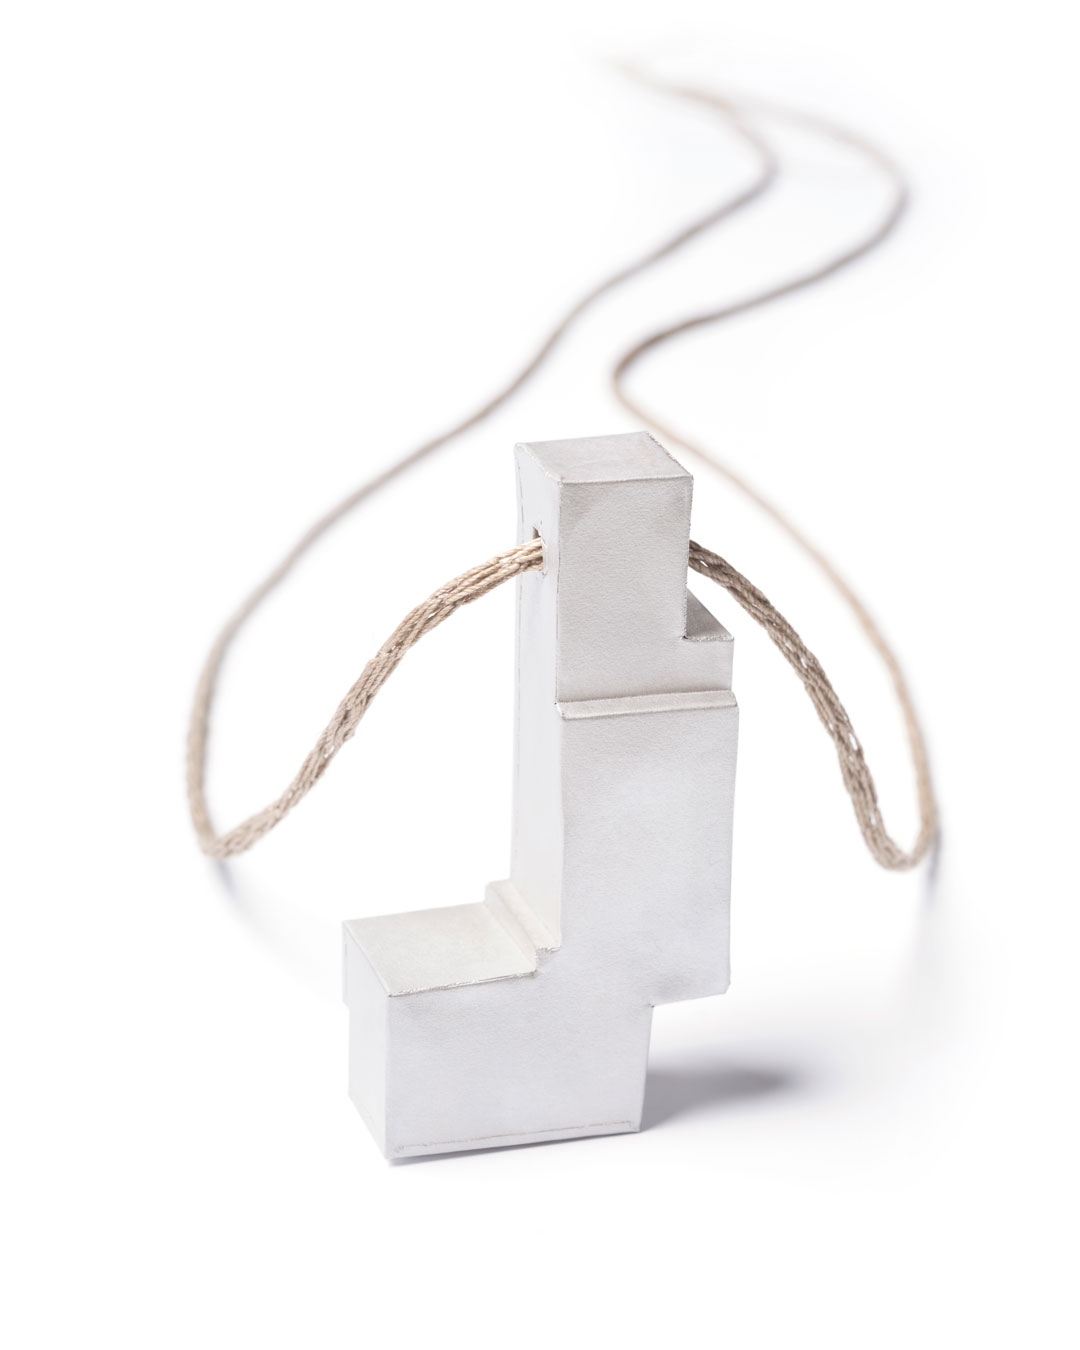 Carla Nuis, Unfurl 14, 2018, pendant; fine silver, linen, 58 x 30 x 14 mm, €600